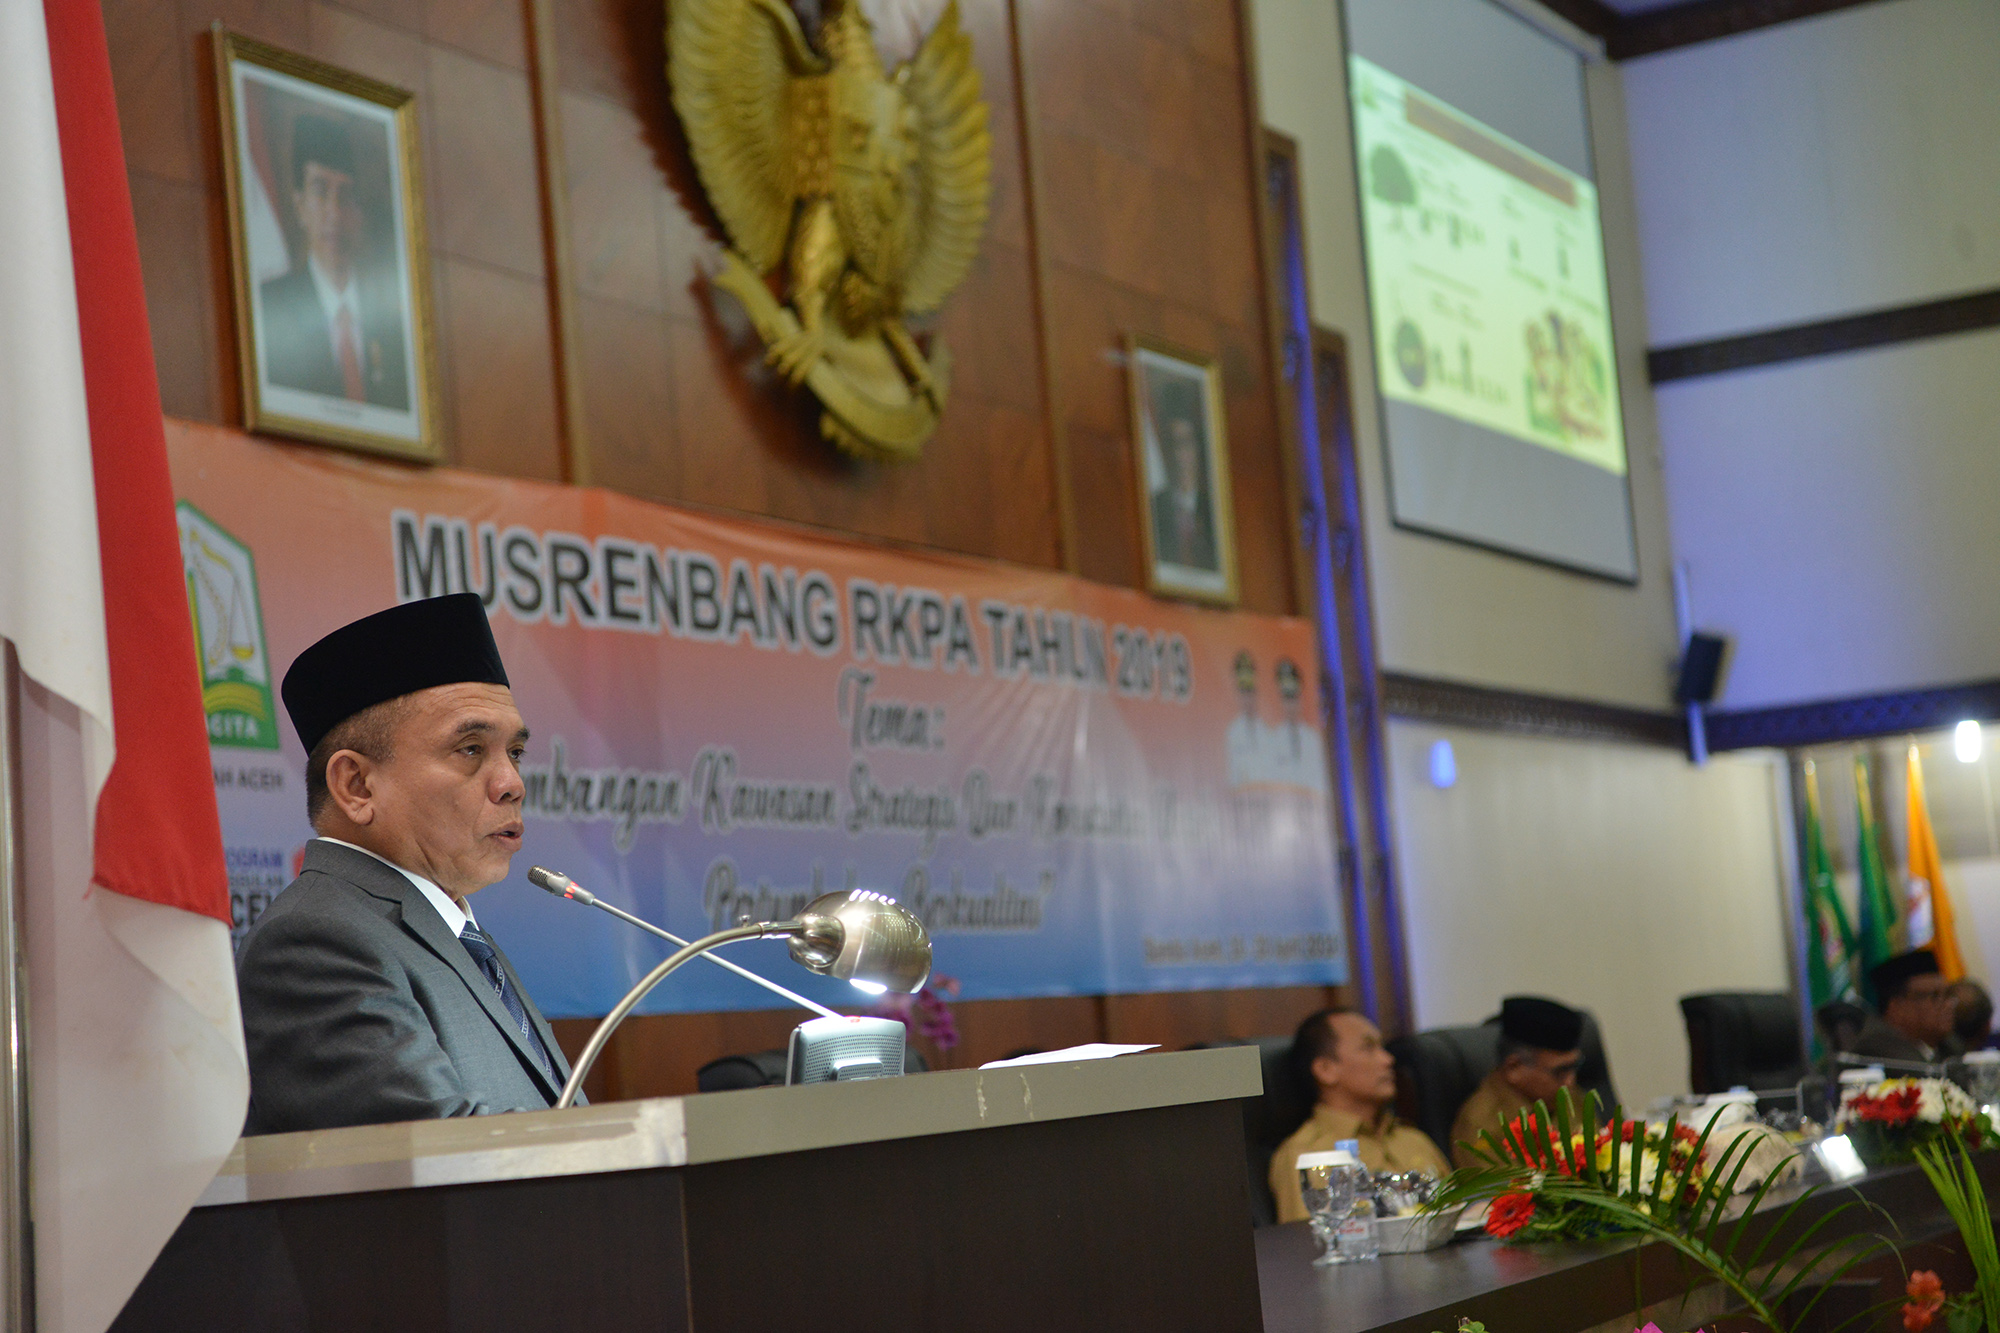 Gubernur Aceh Buka Musrenbang RKPA 2019